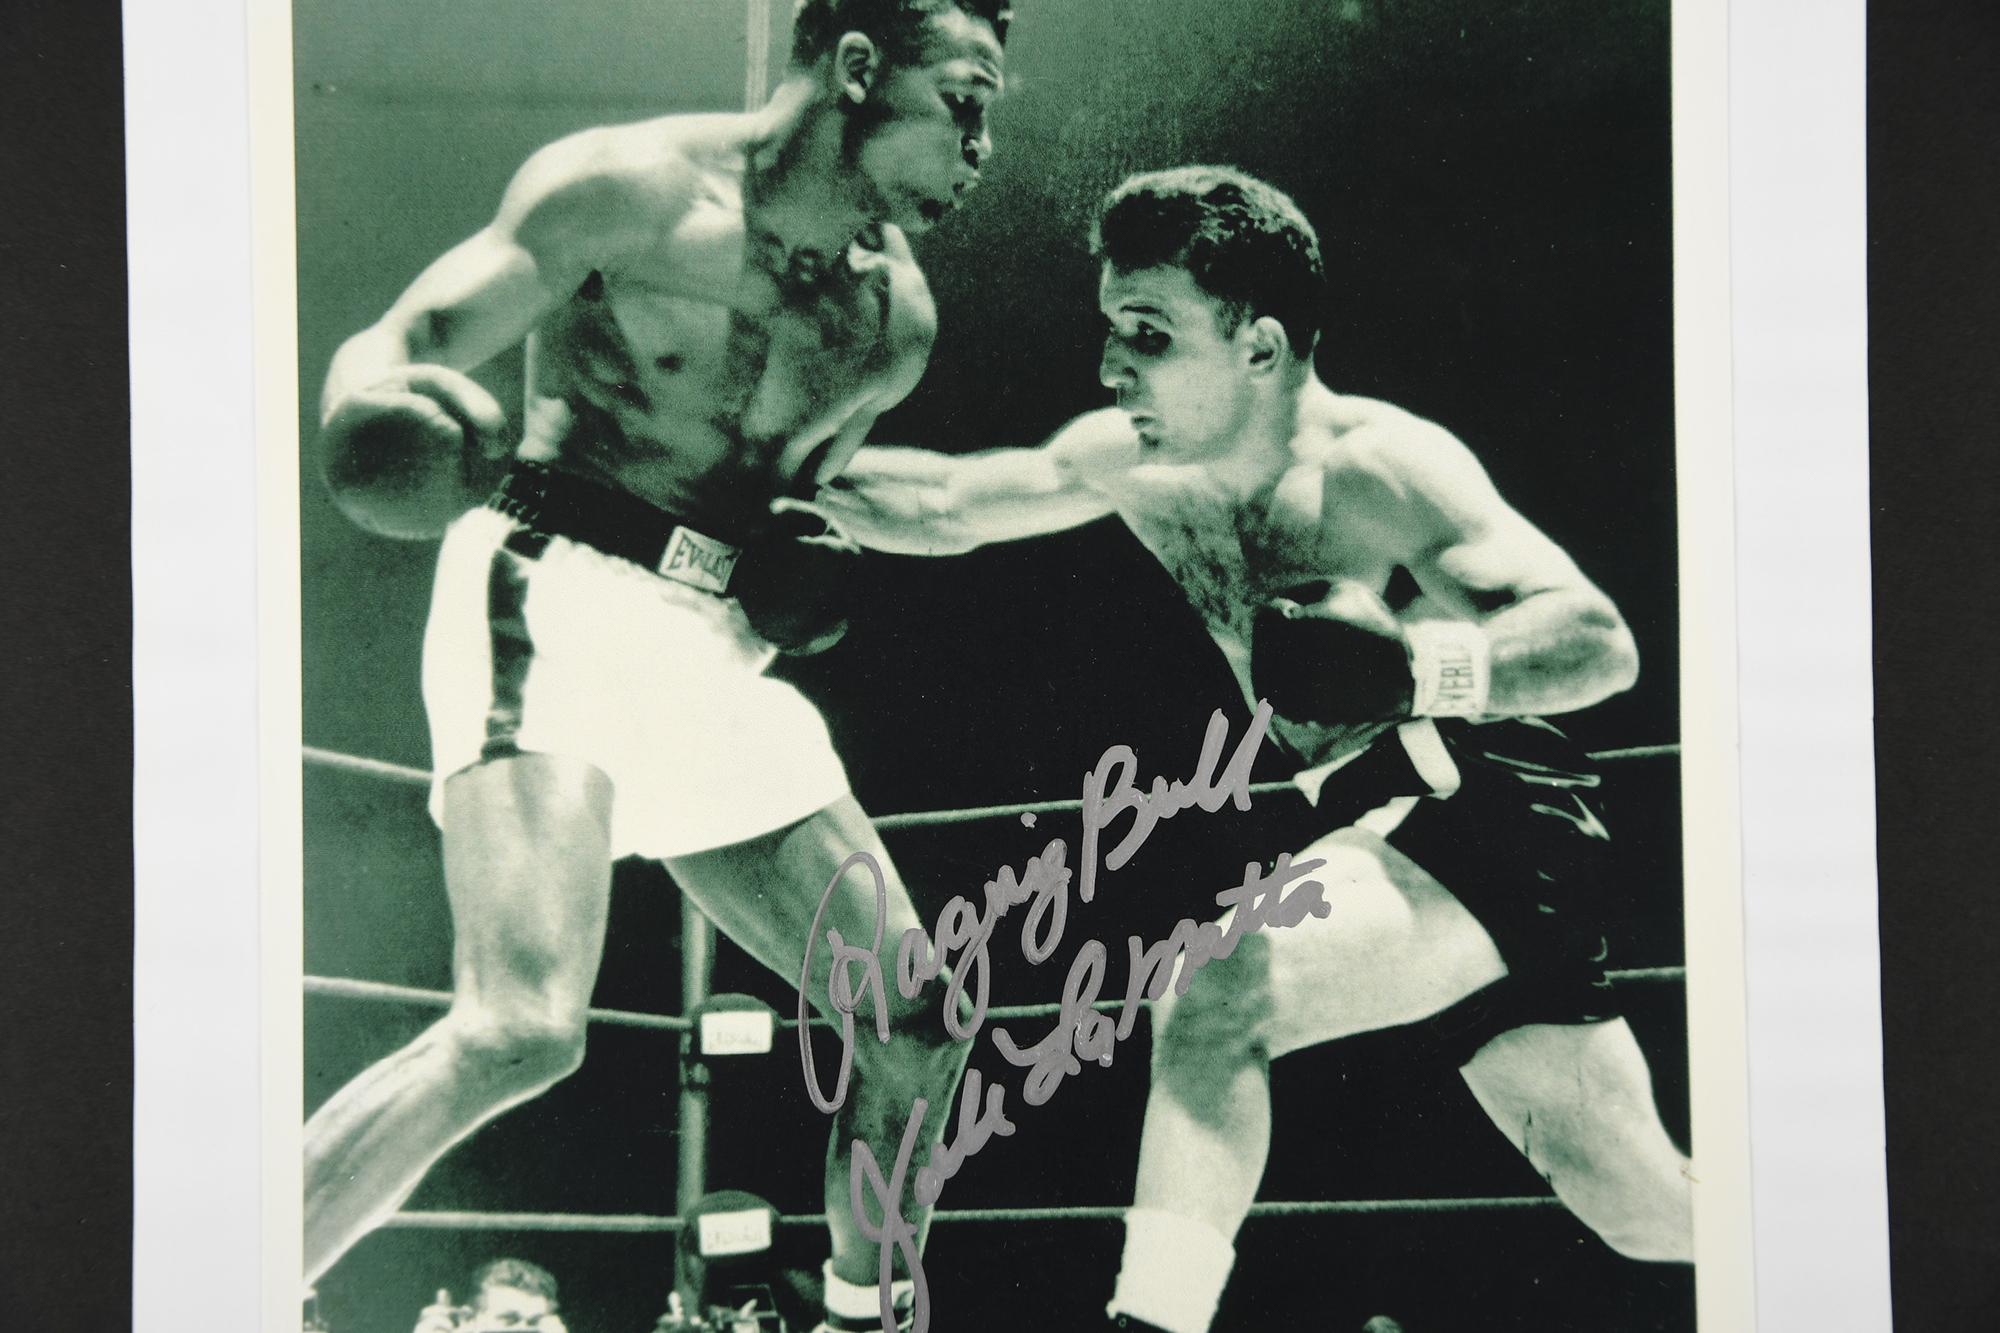 JAKE LA MOTTA Original signature - Image 3 of 3